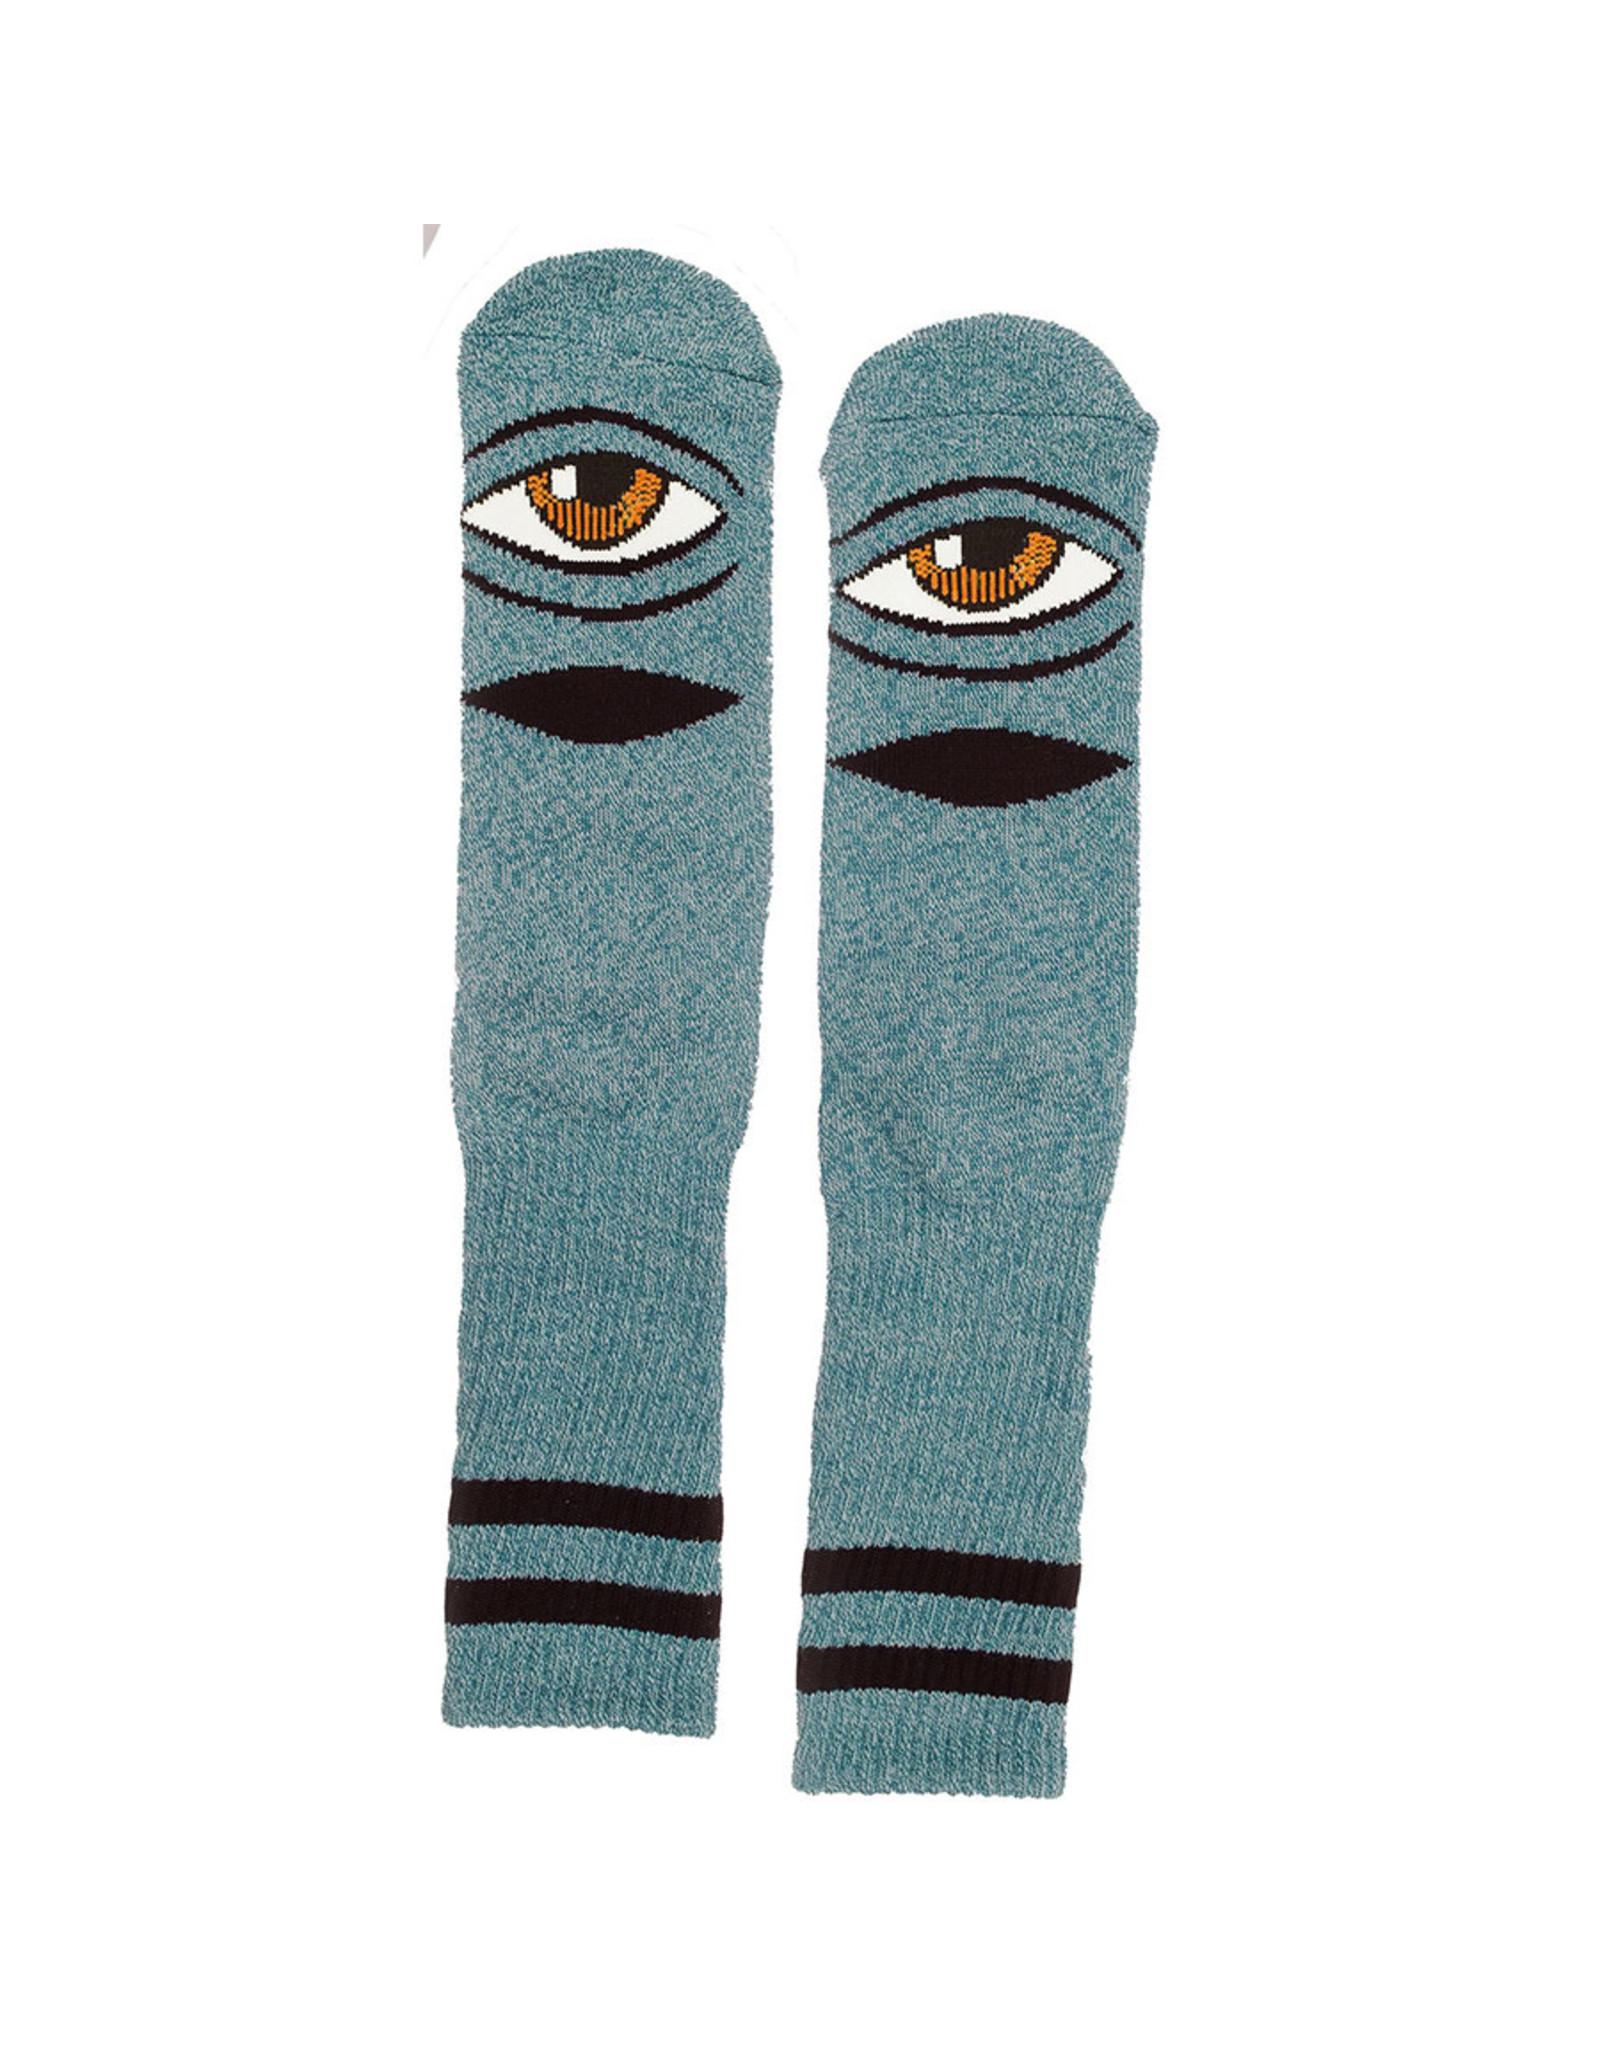 Toy Machine Toy Machine Socks Heather Sect Eye Crew (Turquoise Heather)